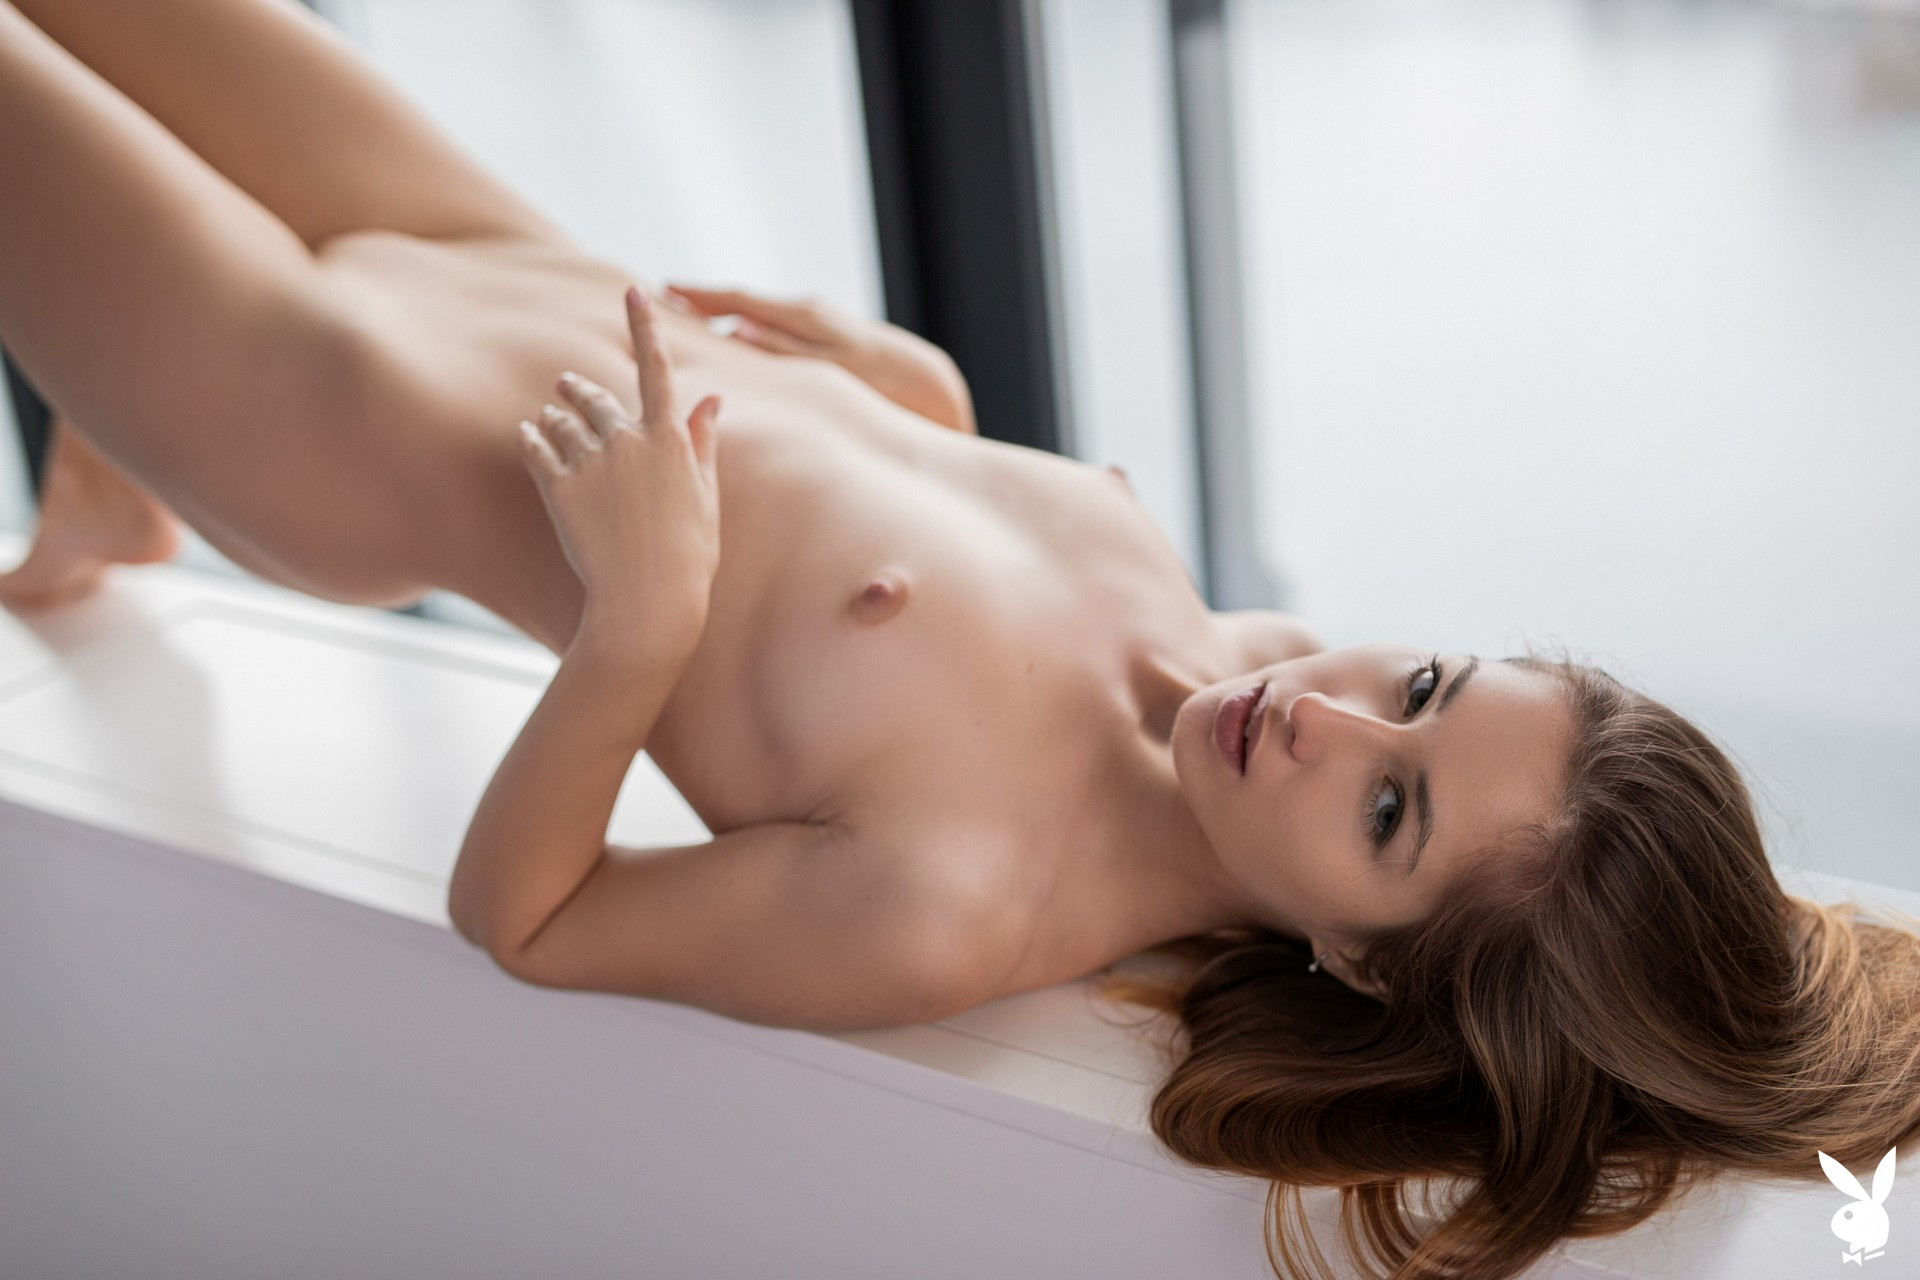 Diana Lark In Irresistible Charm Playboy Plus (25)